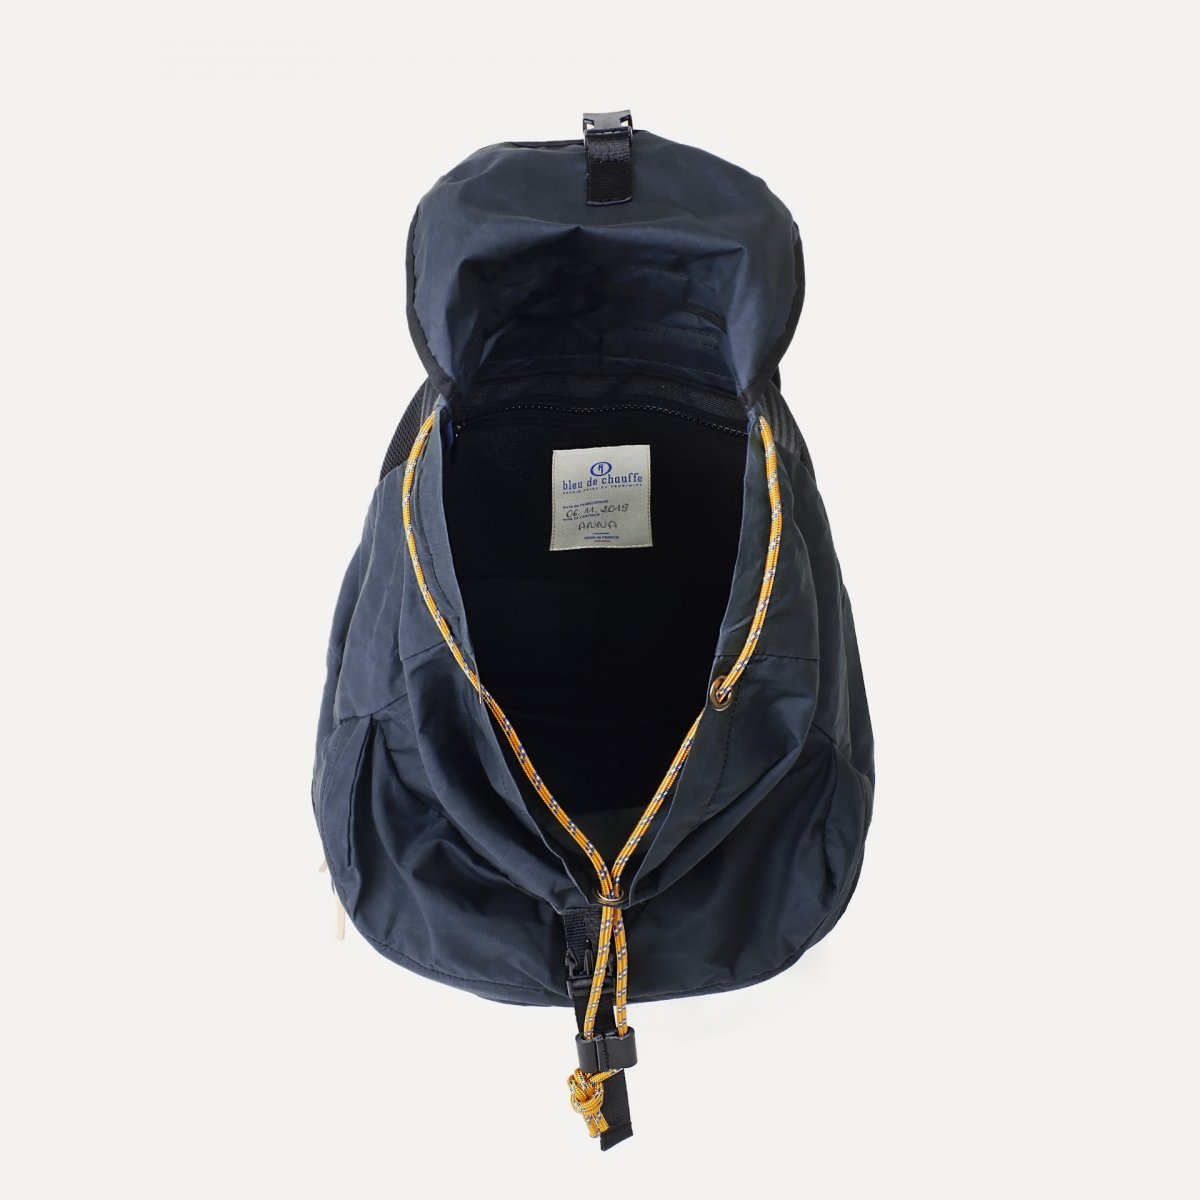 23L Bayou Backpack - Hague Blue (image n°4)